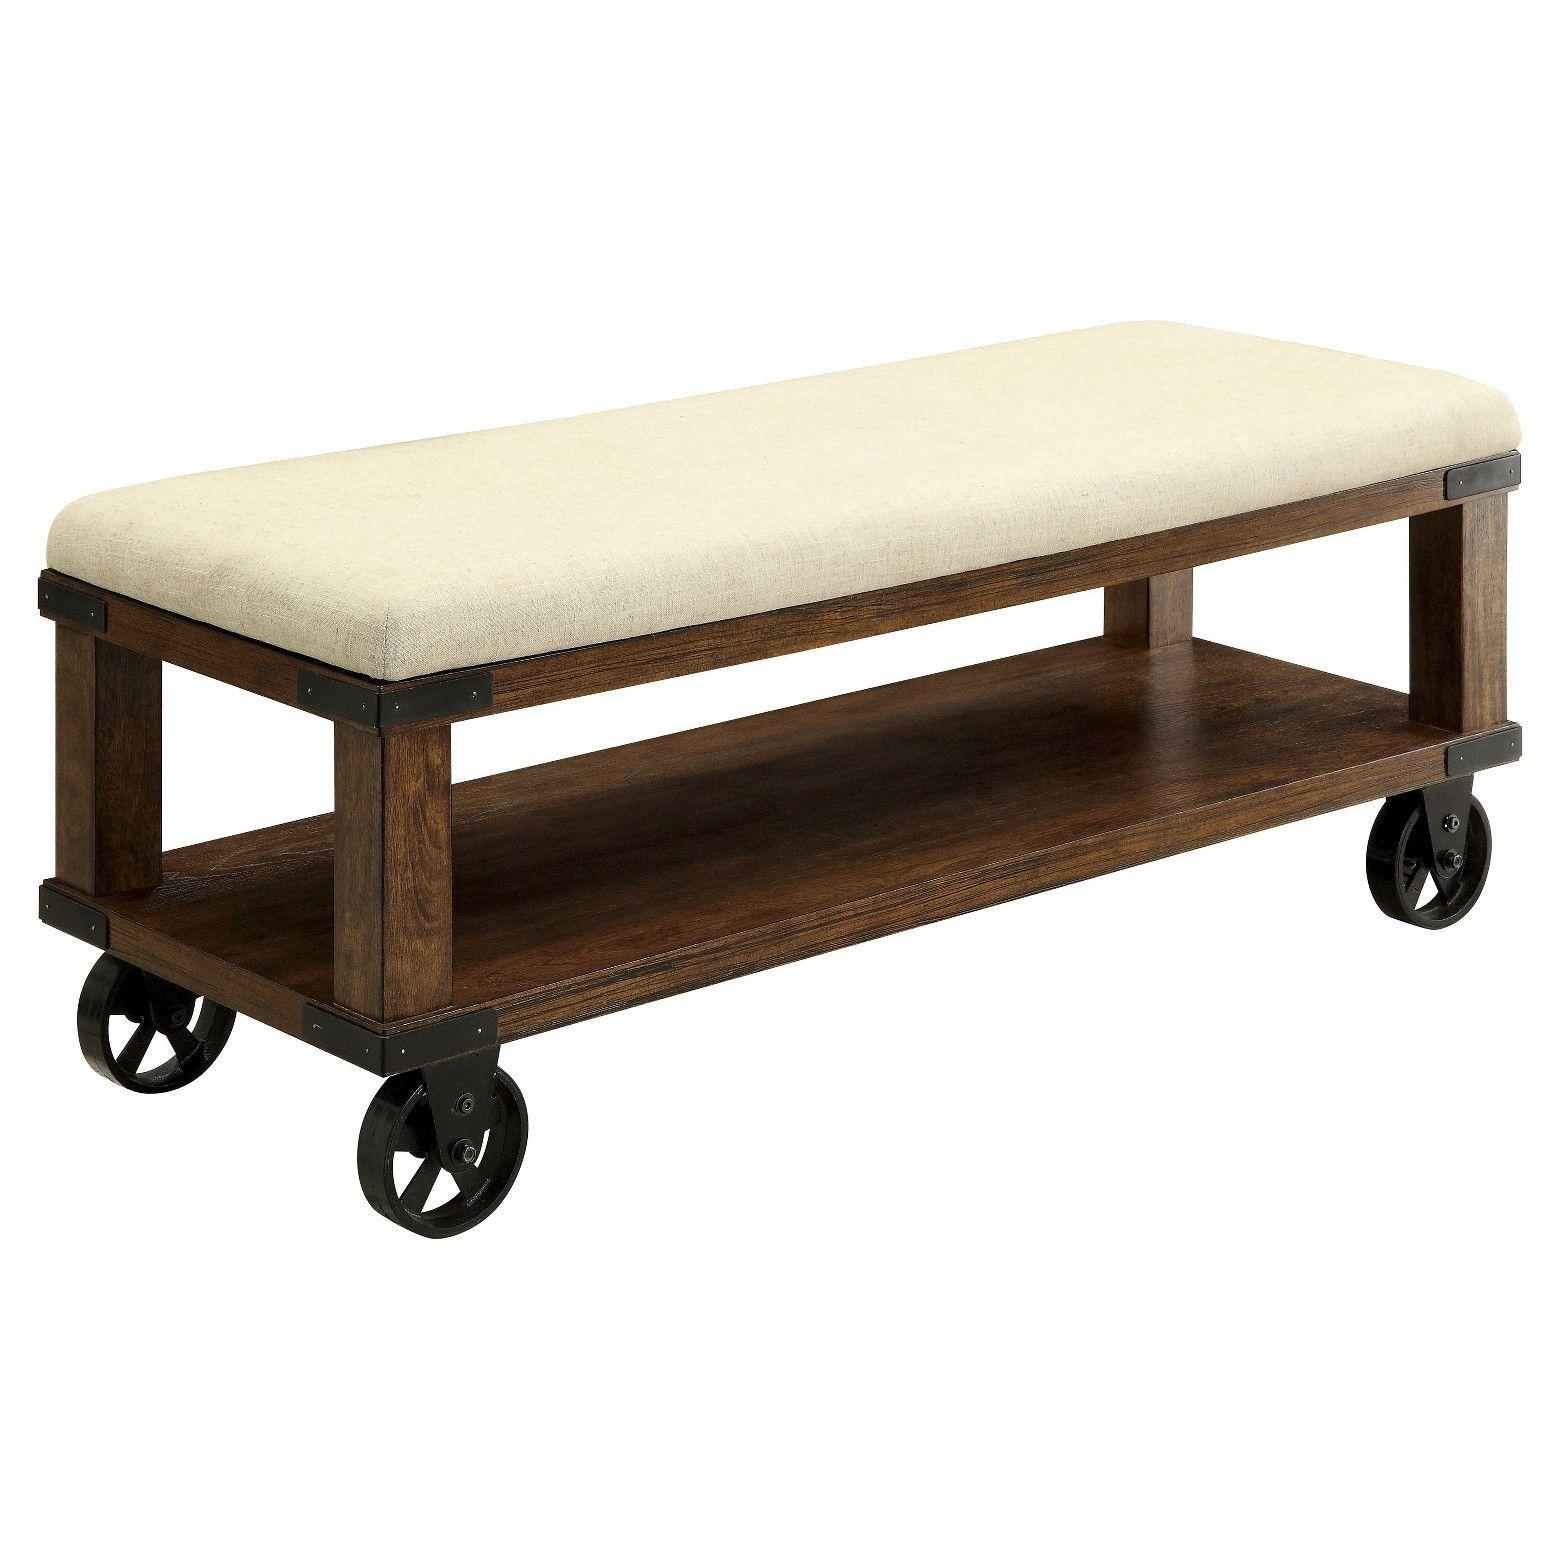 industrial furniture wheels. The Furniture Of America Veren Cushioned Castor Wheel Bench In Light Oak Is An Industrial Style Wheels C